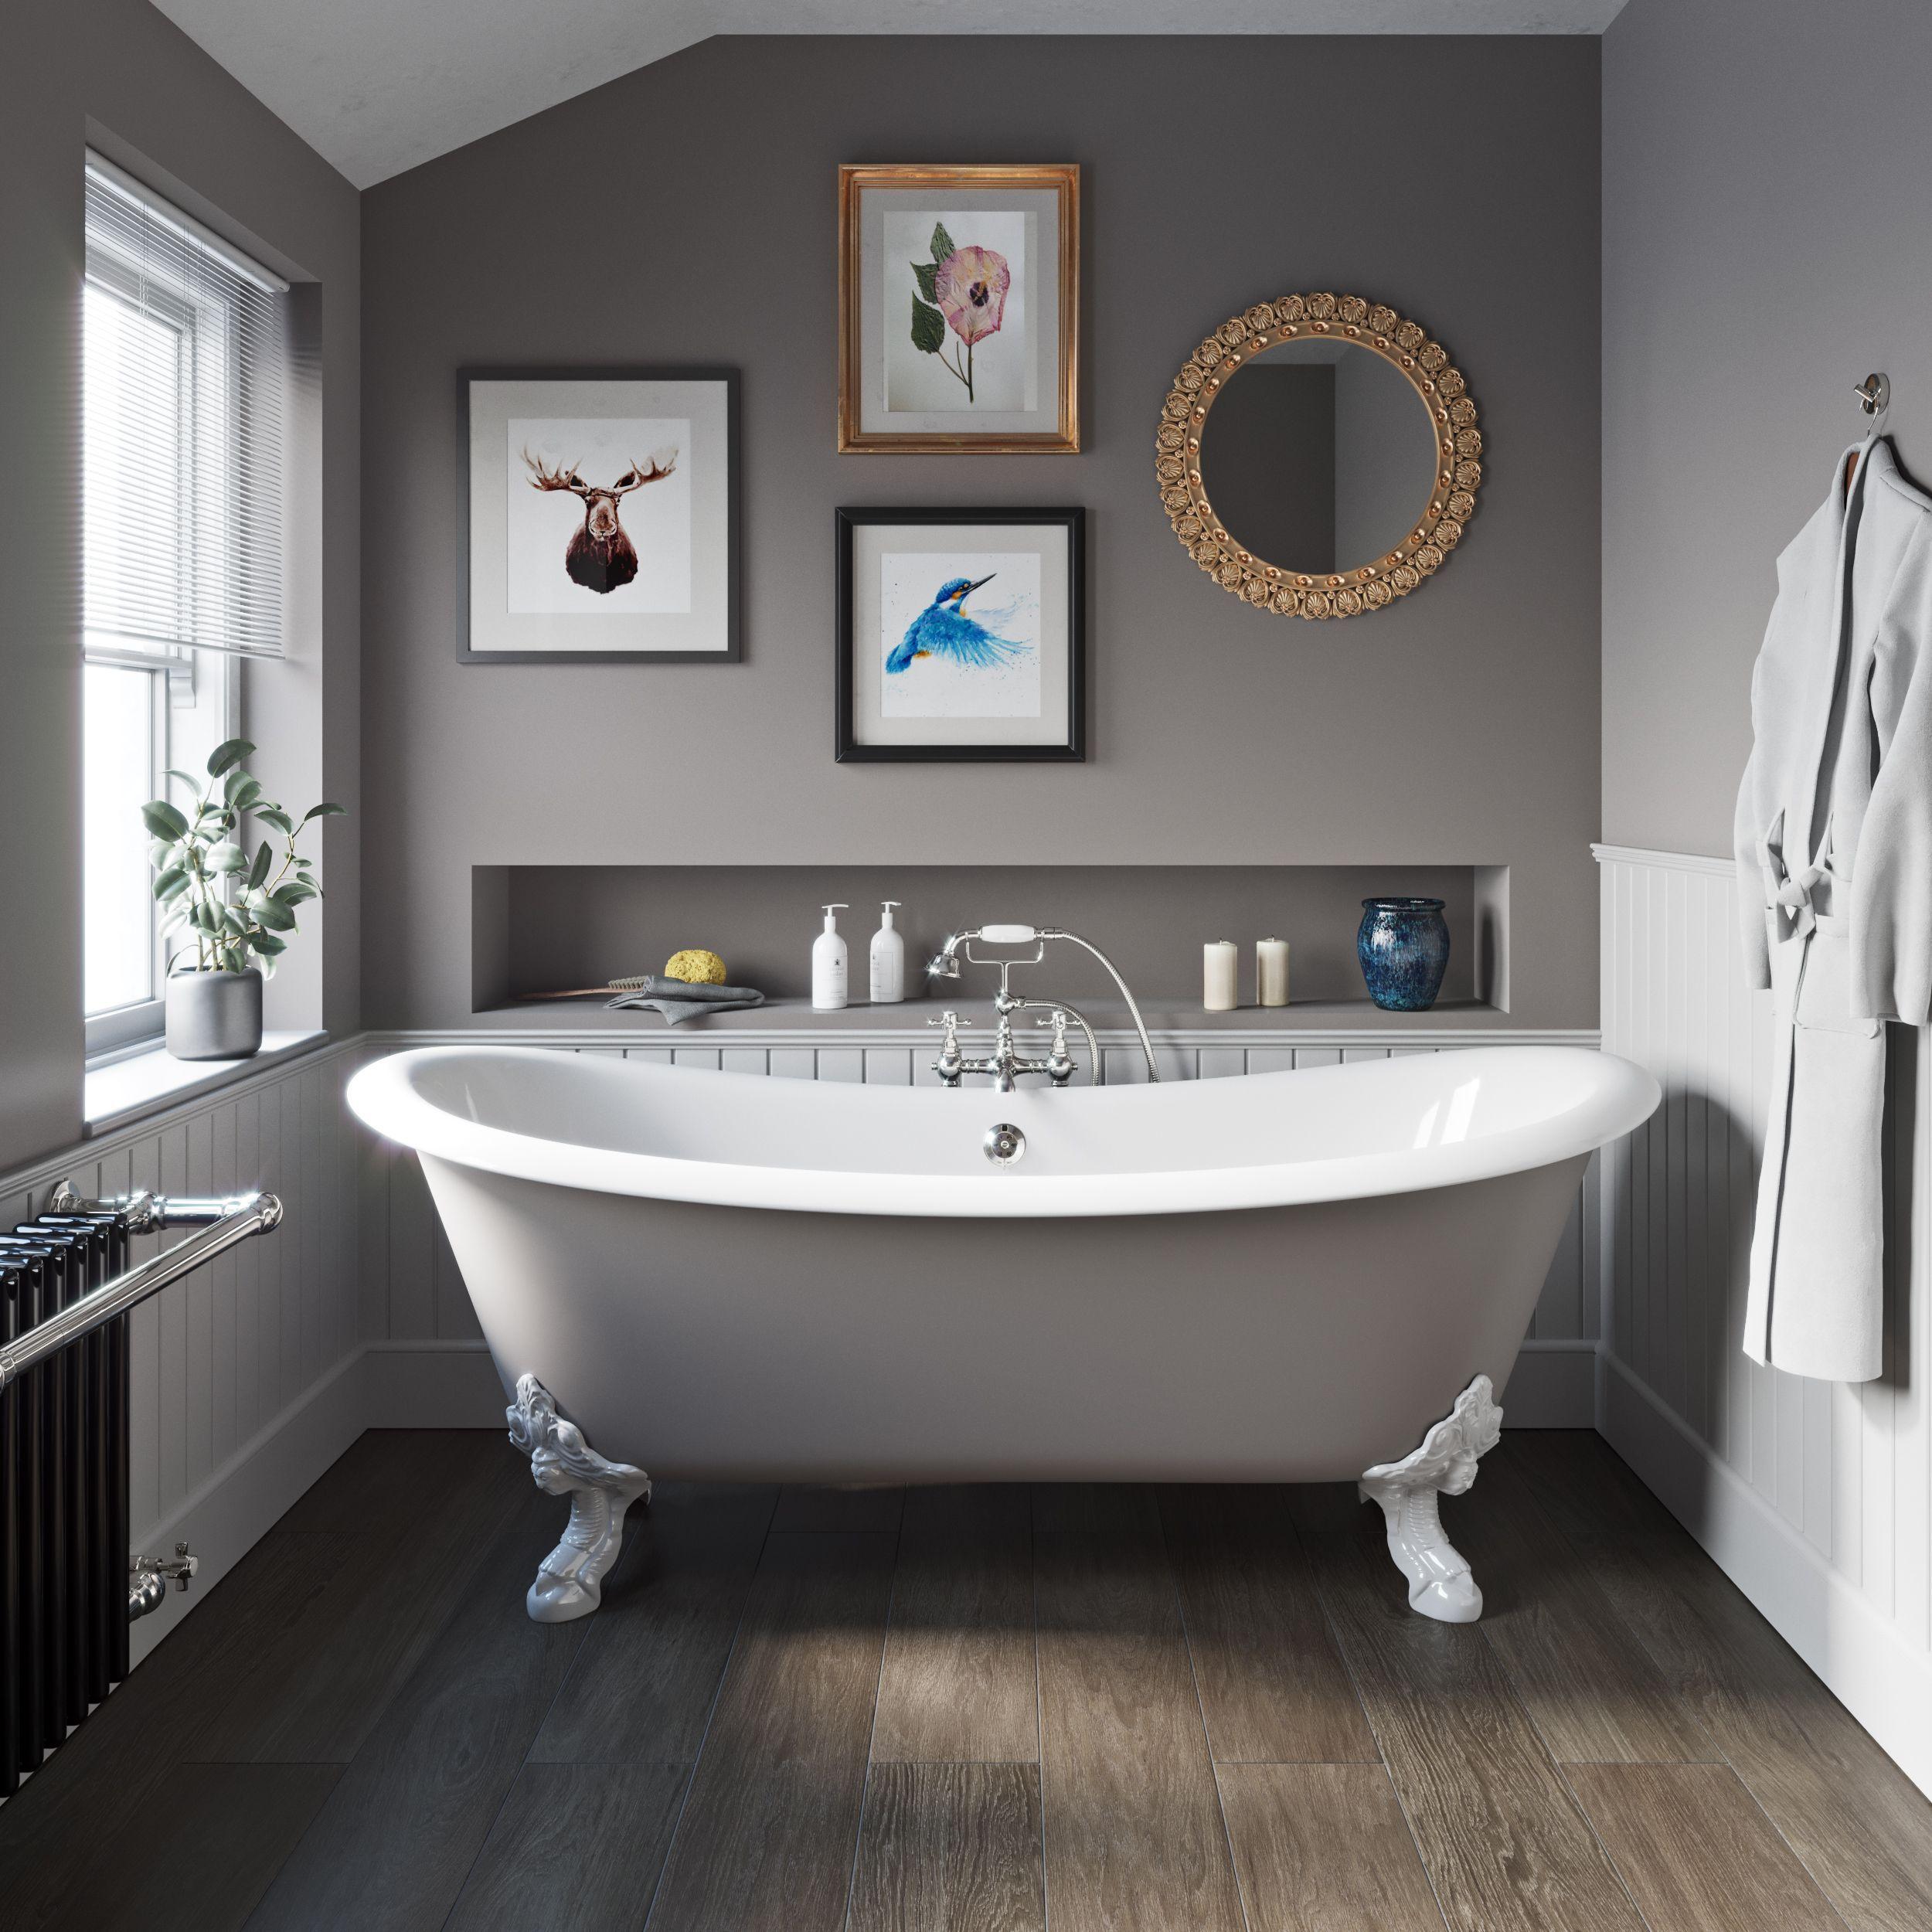 Looking At Freestanding Baths Don T Miss These Bathroom Interior Design Bathroom Wall Decor Bathroom Interior